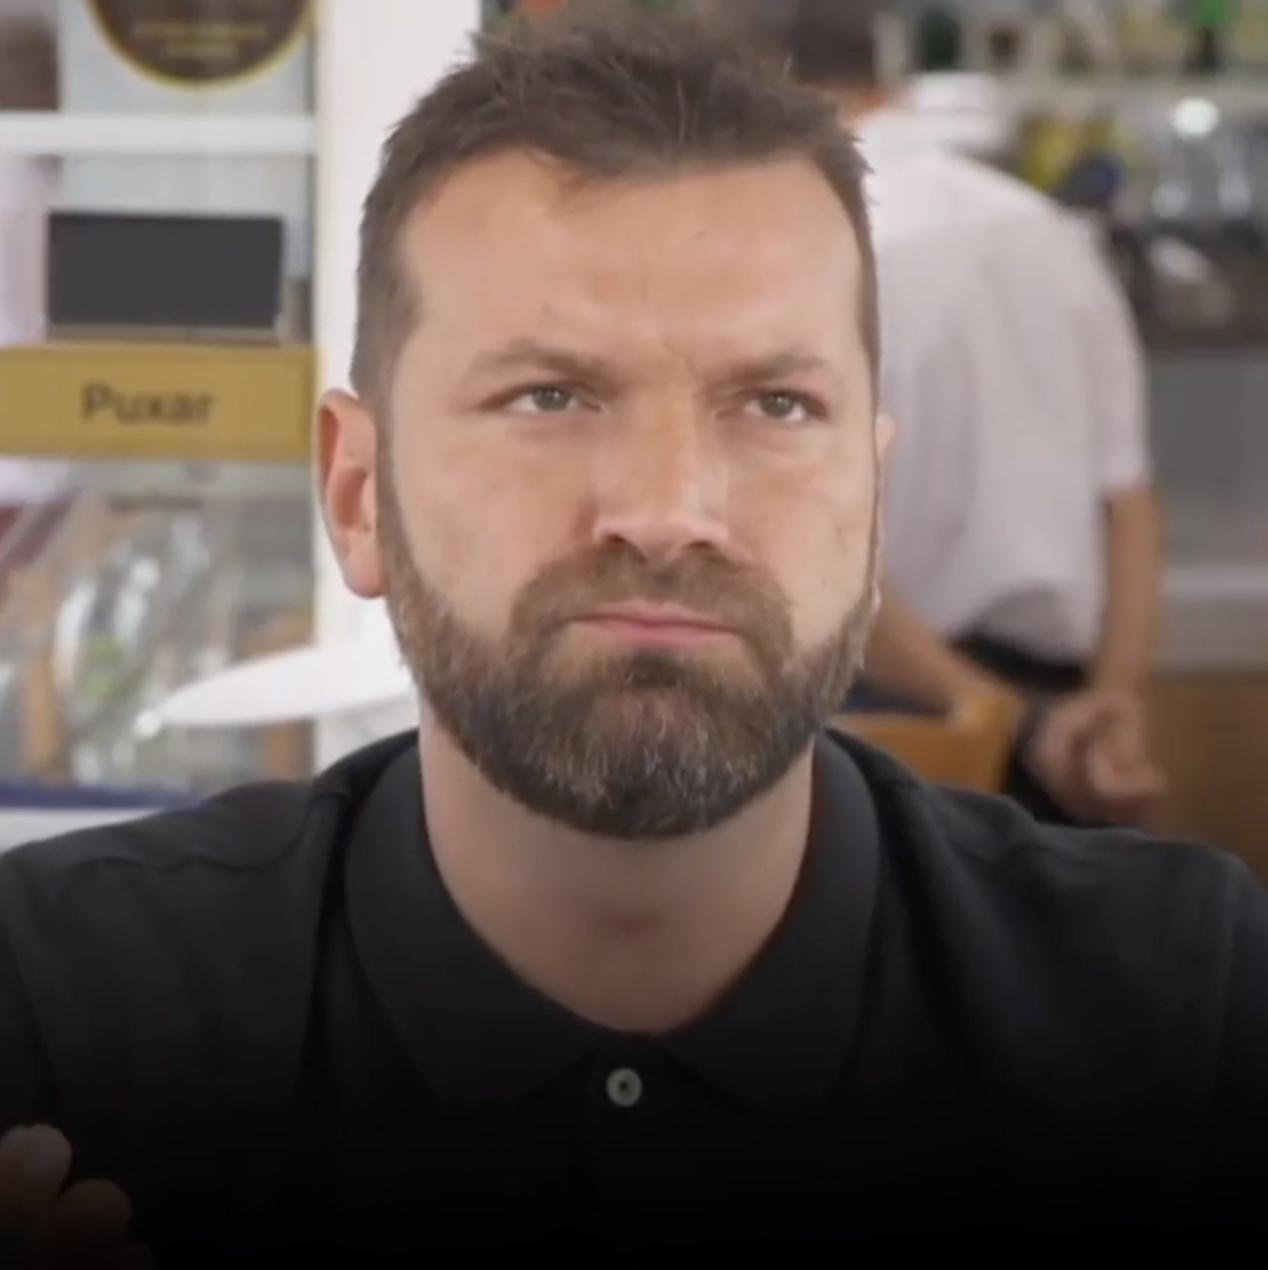 Ljubomir Stanisic Stop Tir Pesadelo Na Cozinha: Empregado Do Stop Tir Fugiu De Ljubomir Stanisic